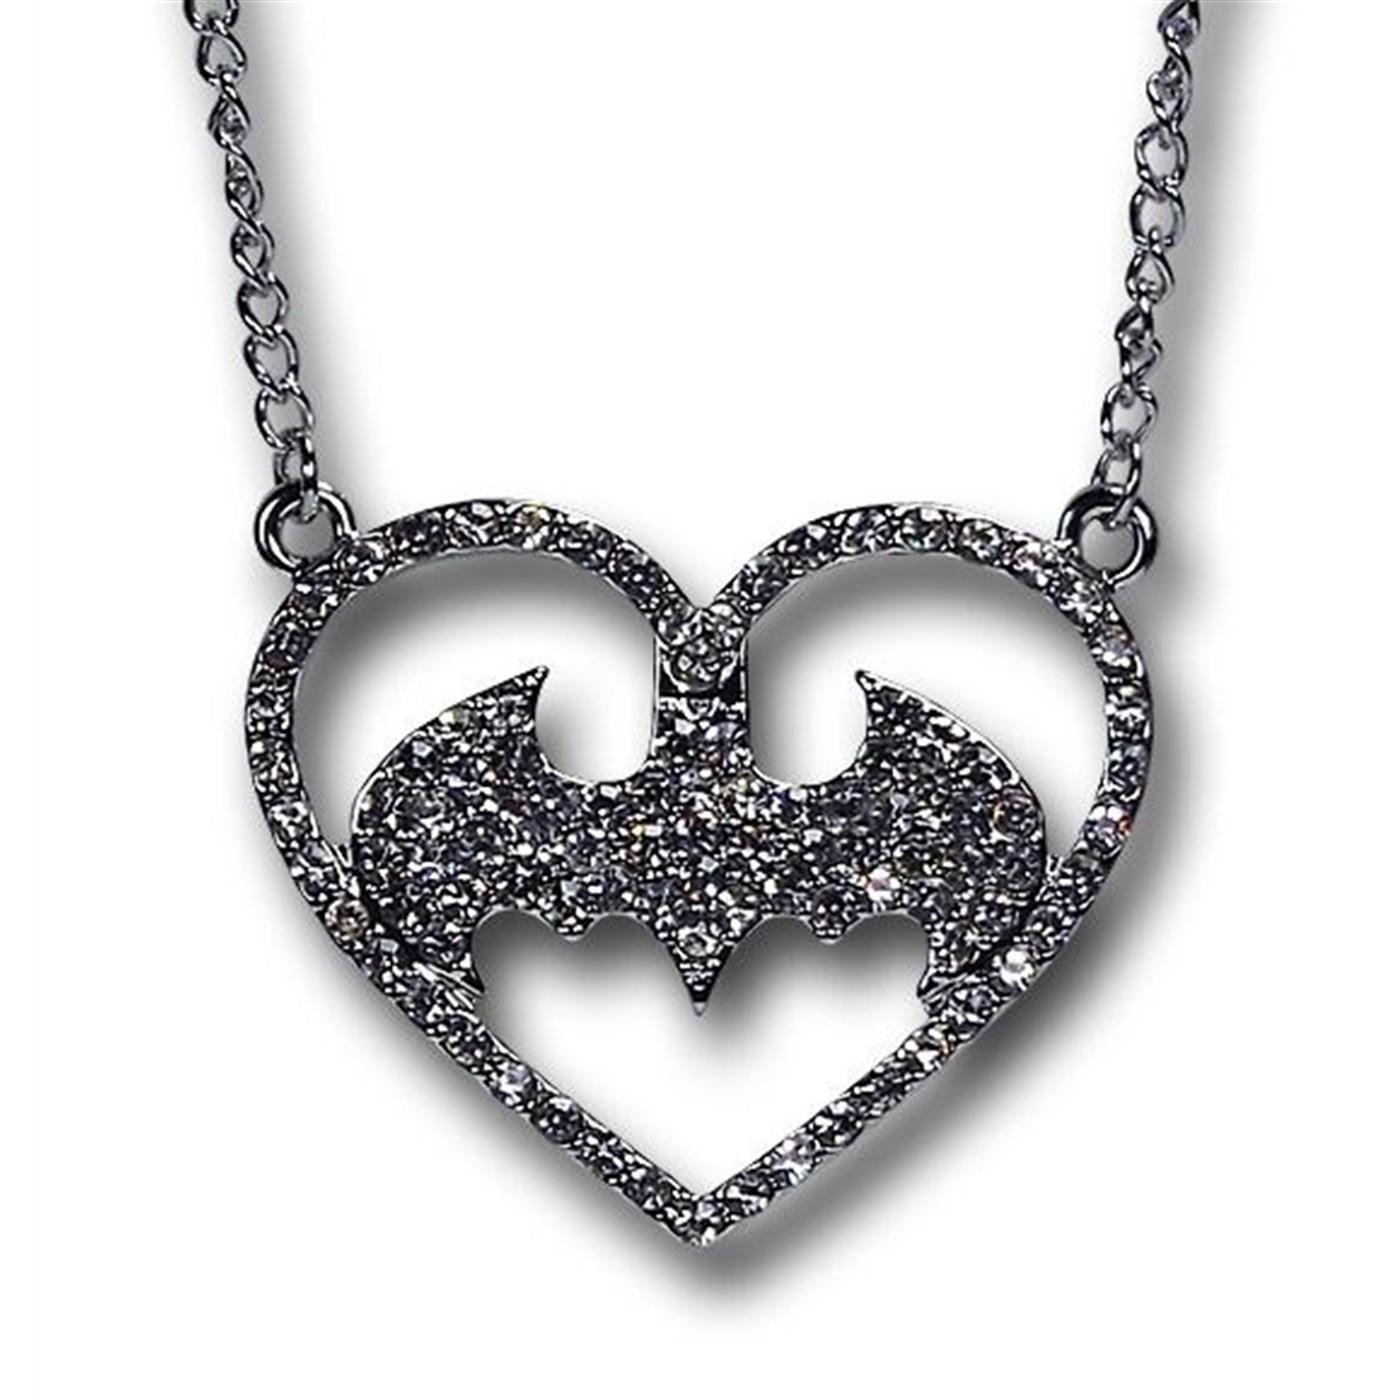 Batman Heart Necklace